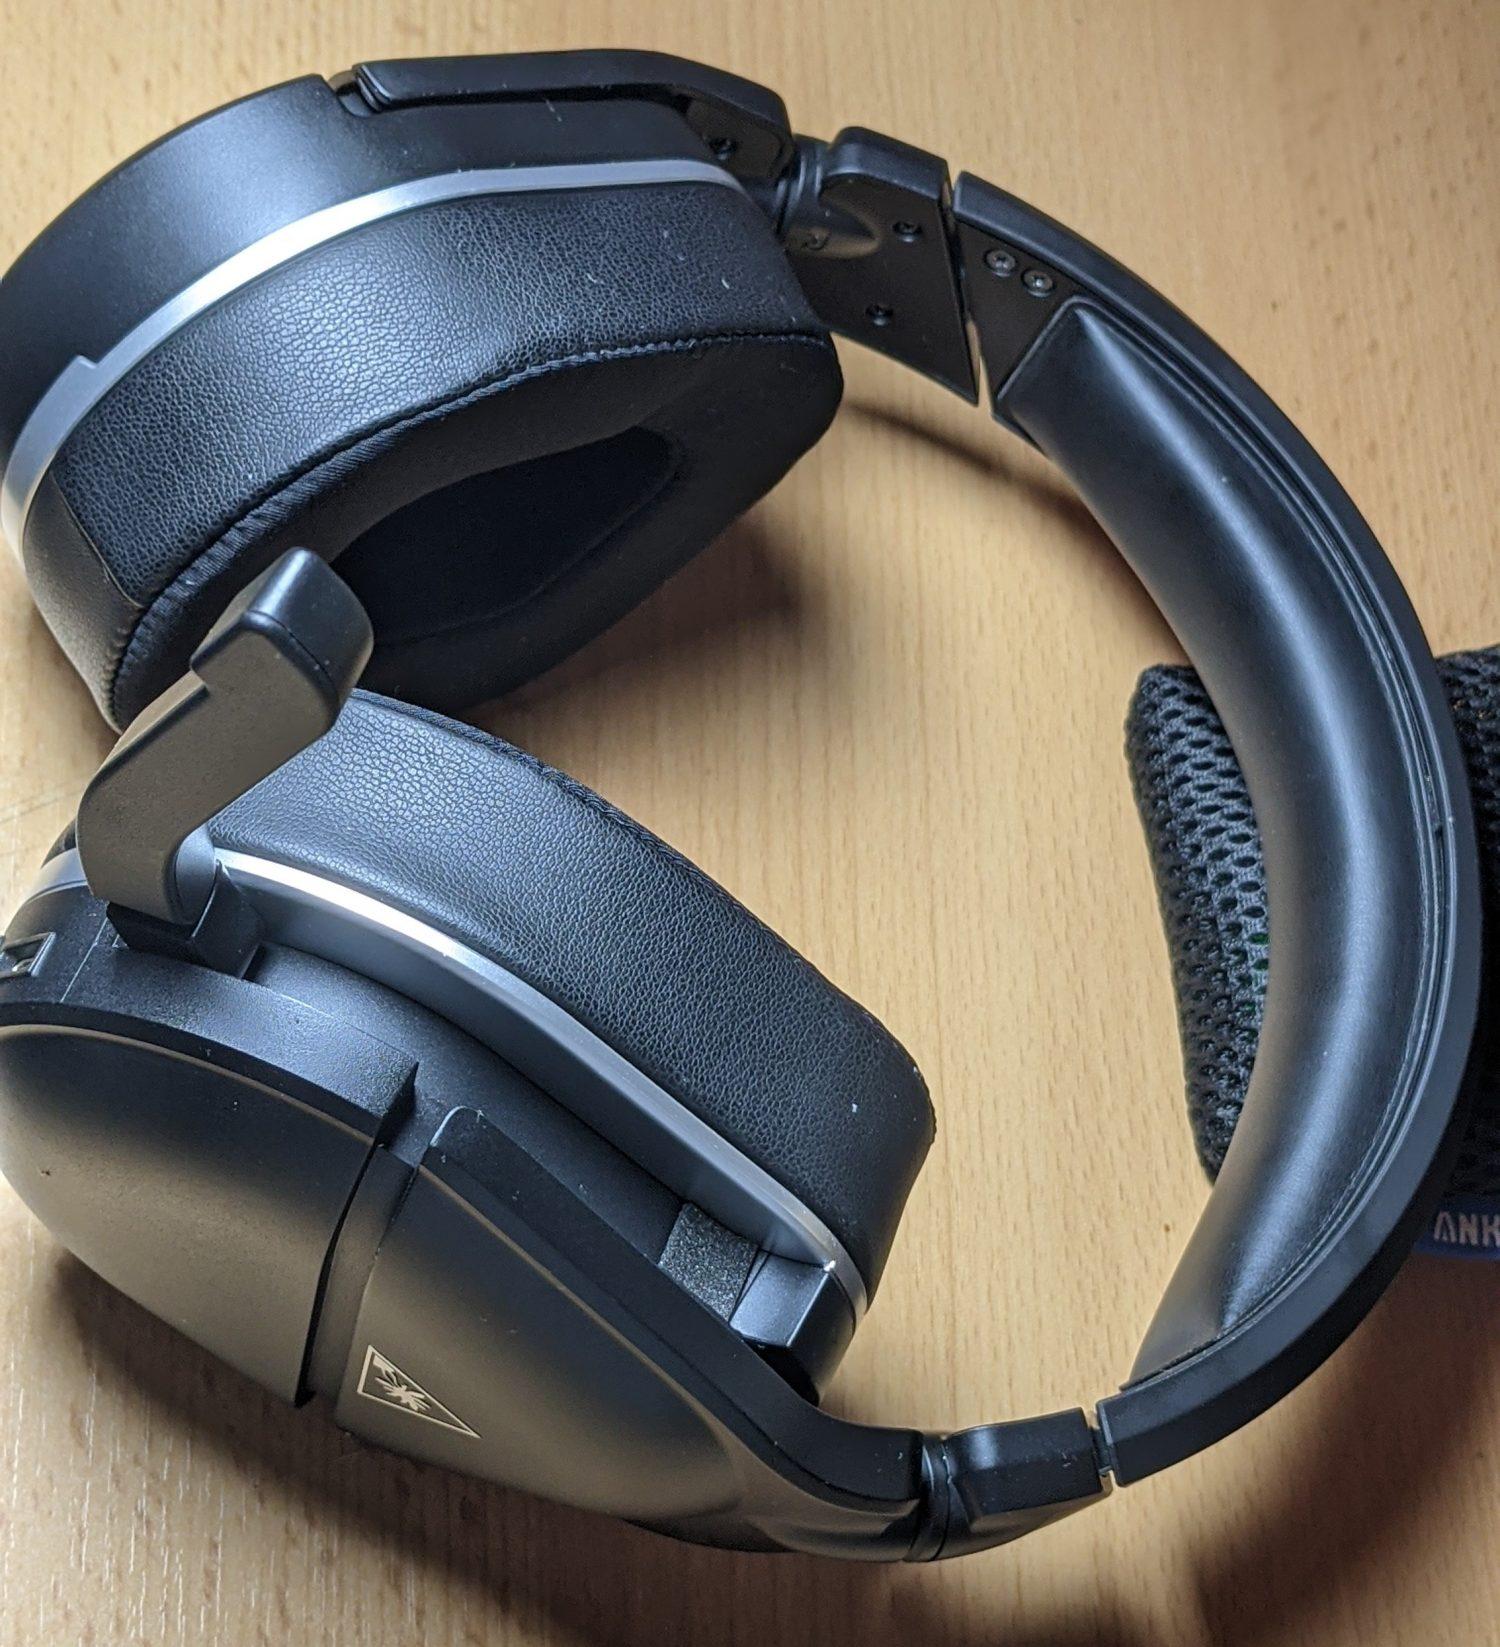 Headset Turtlebeach Stealth 700